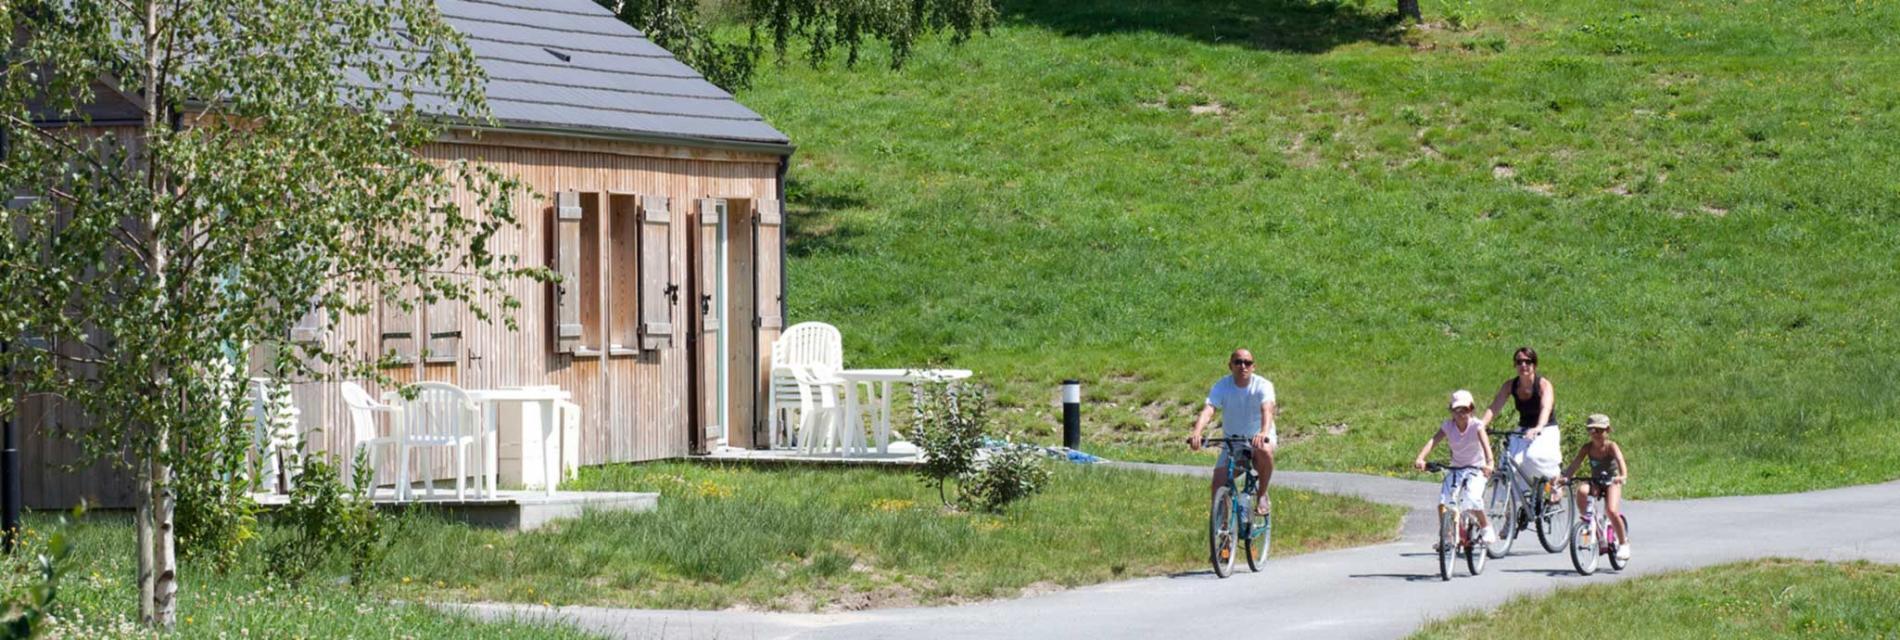 Slide Balade en vélo dans la résidence